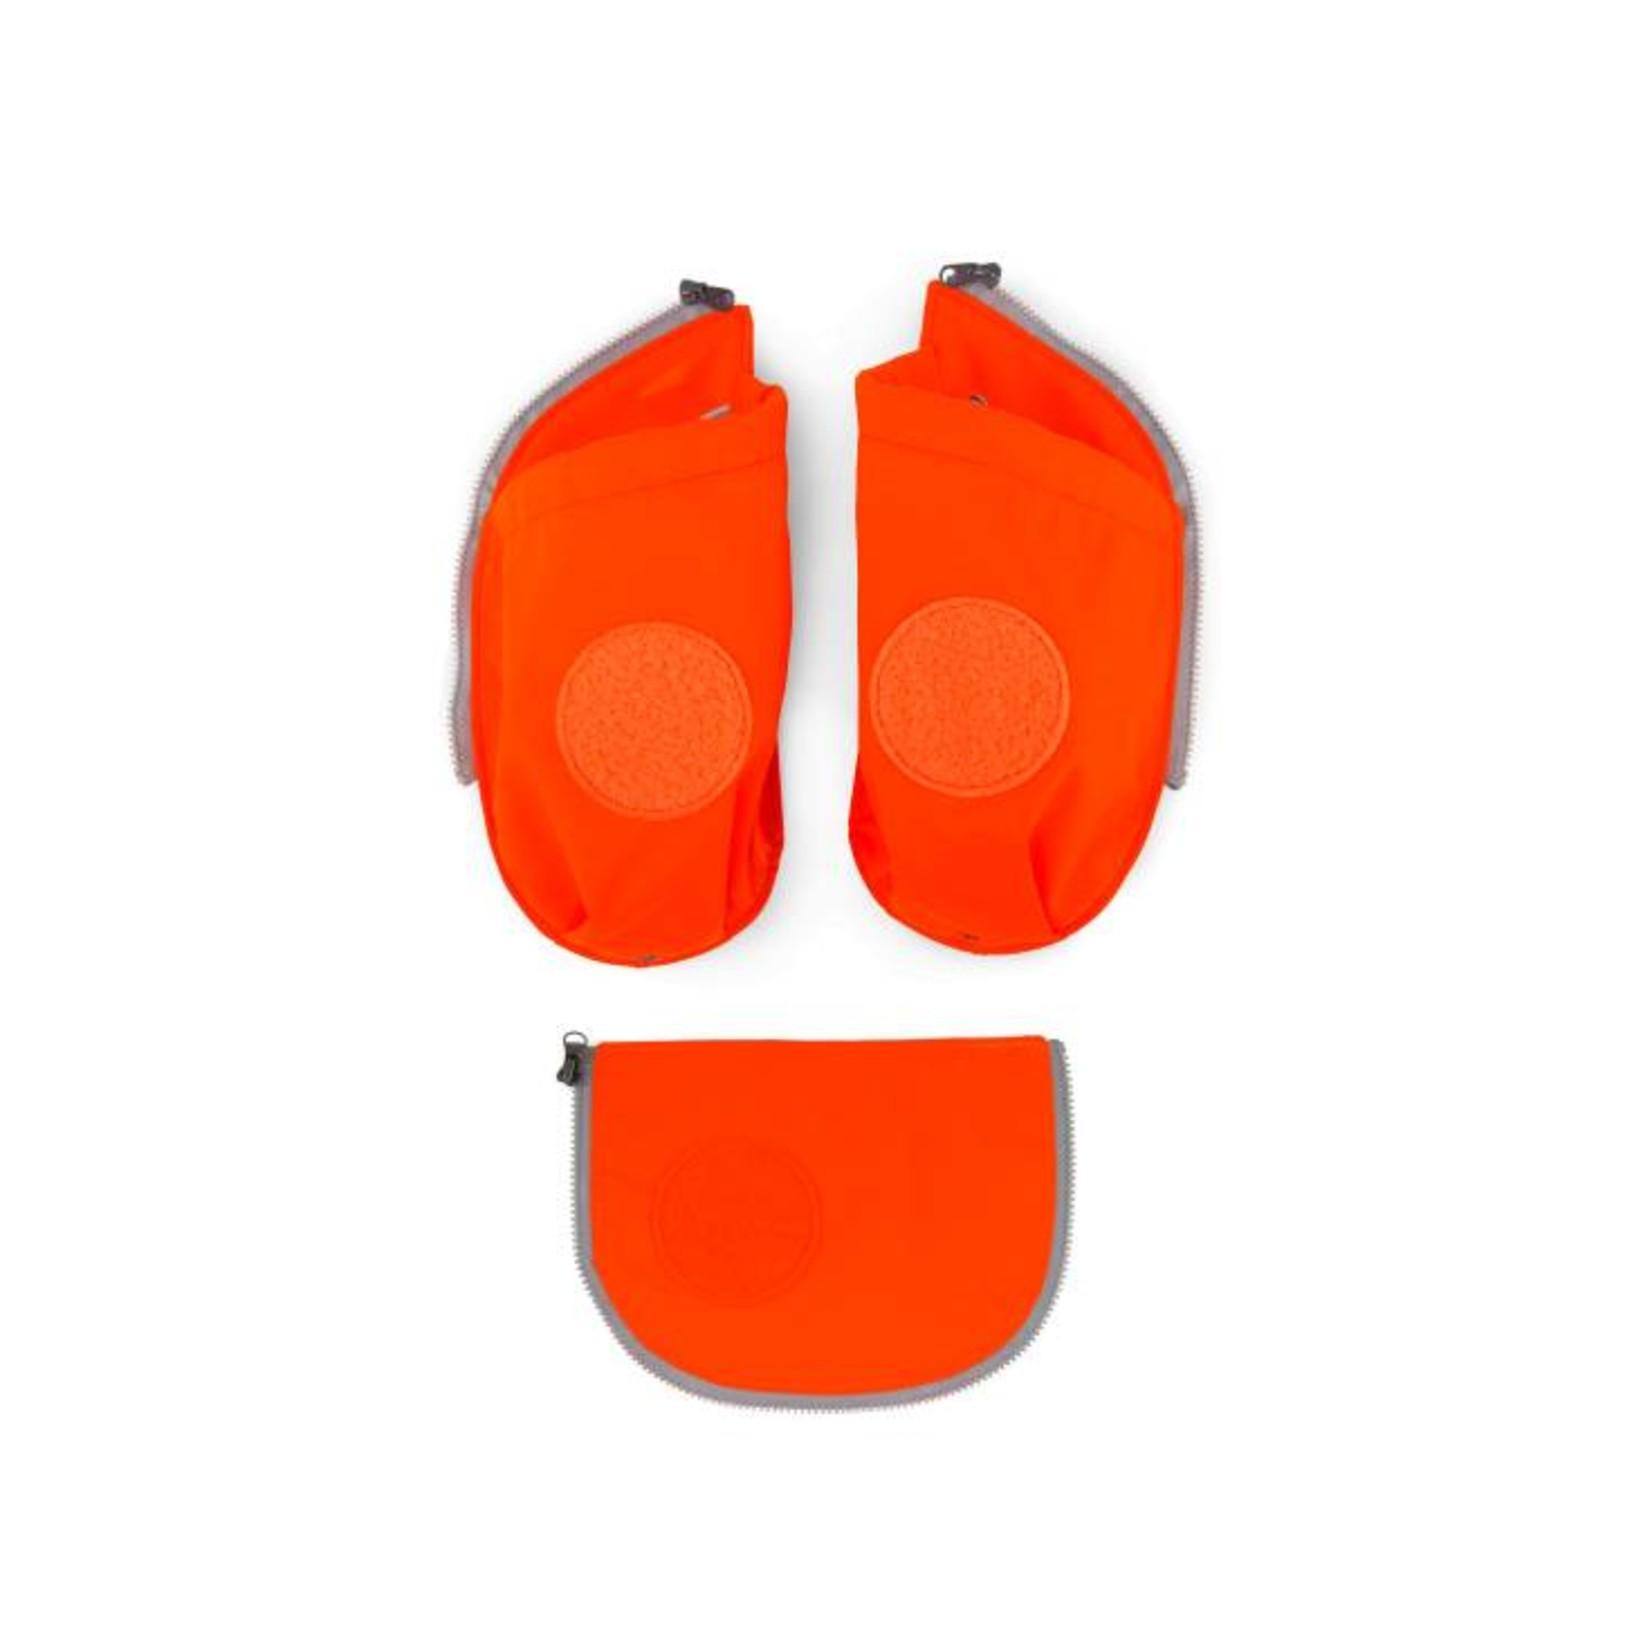 ERGOBAG ERGOBAG CUBO SEITENTASCHEN ZIP SET 3tlg orange